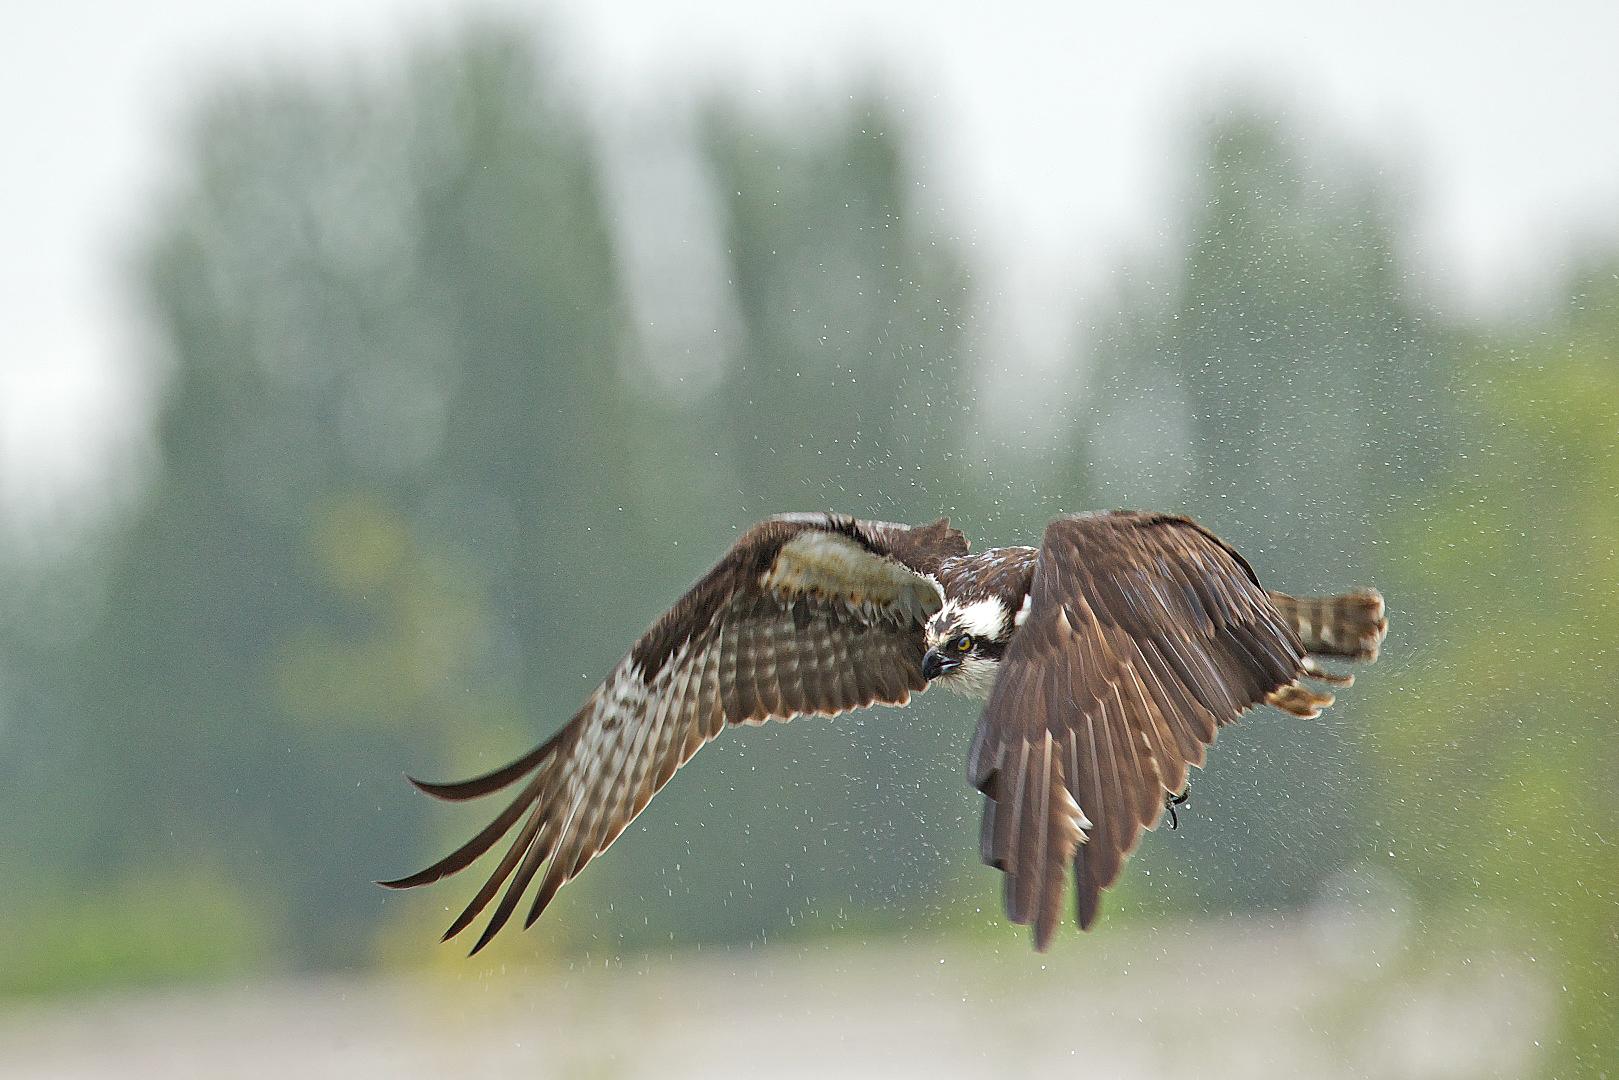 osprey eating fish 1